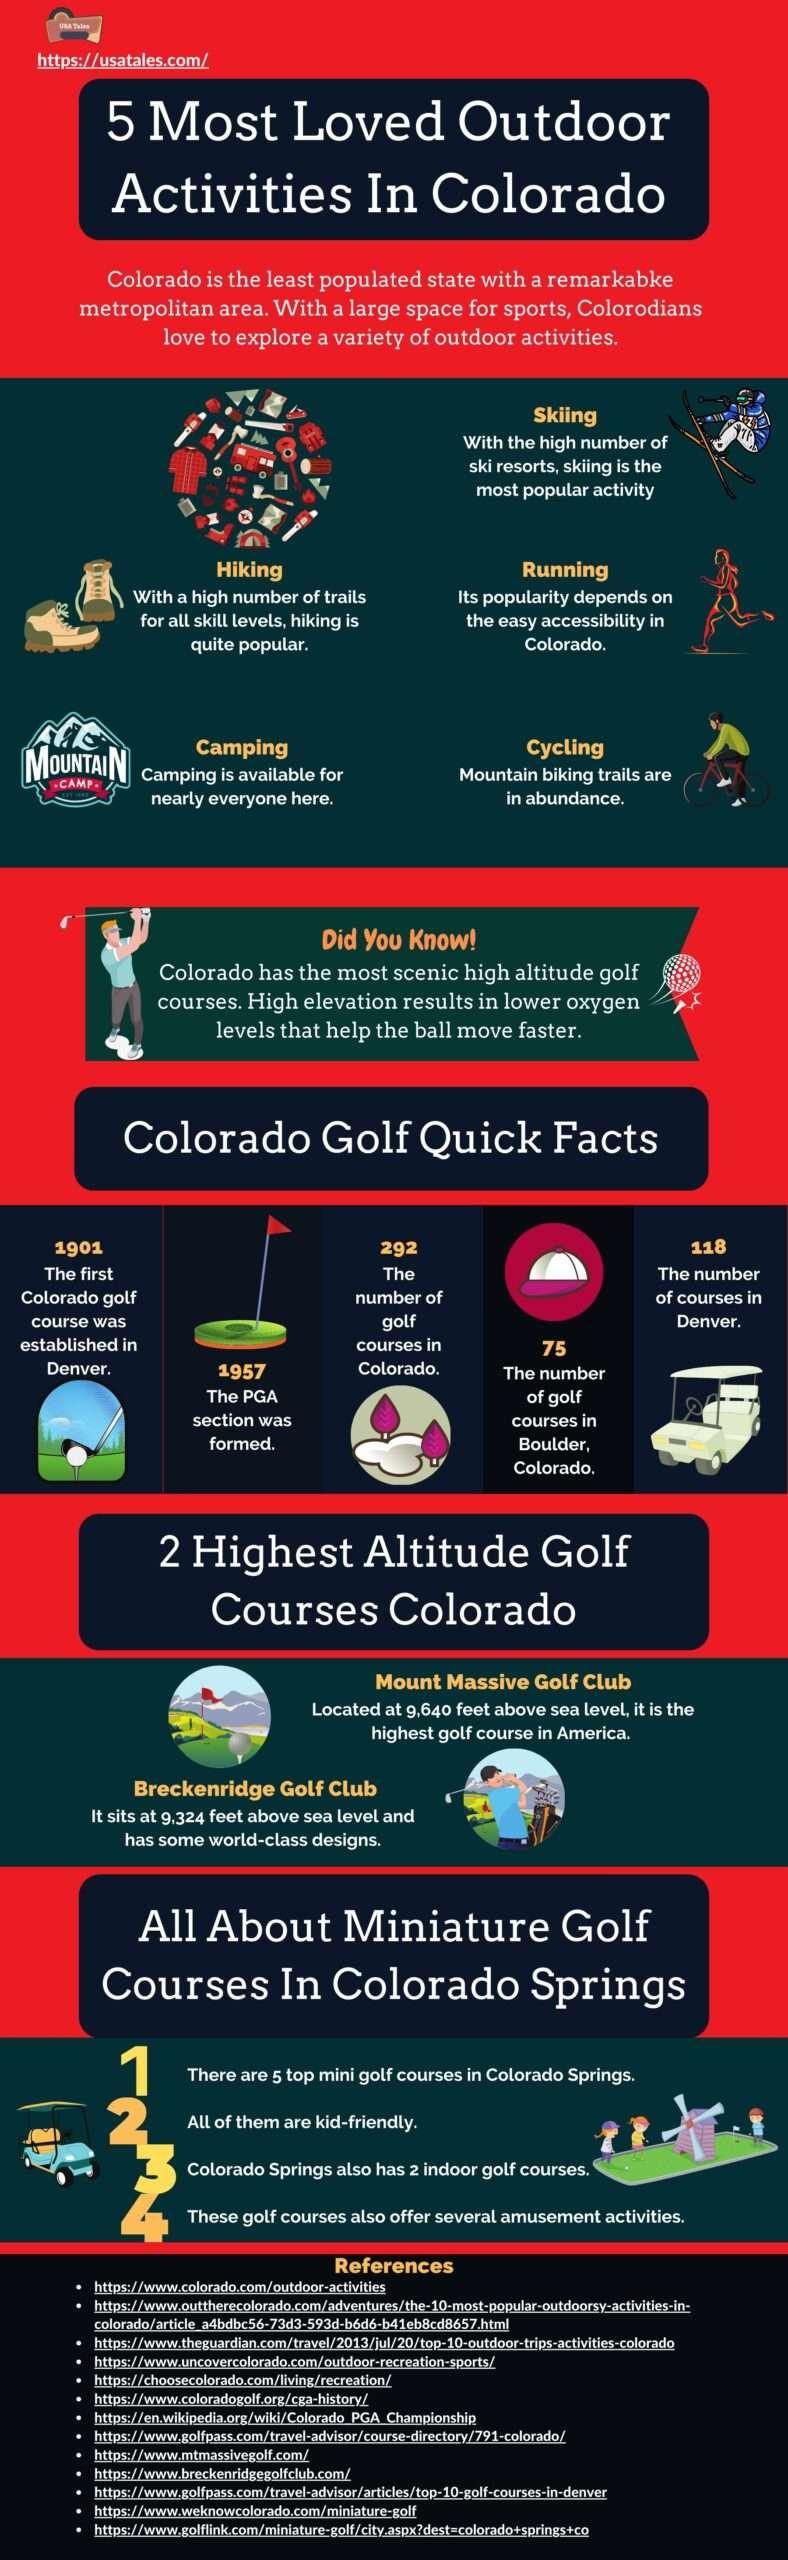 5 Most Loved Outdoor Activities In Colorado